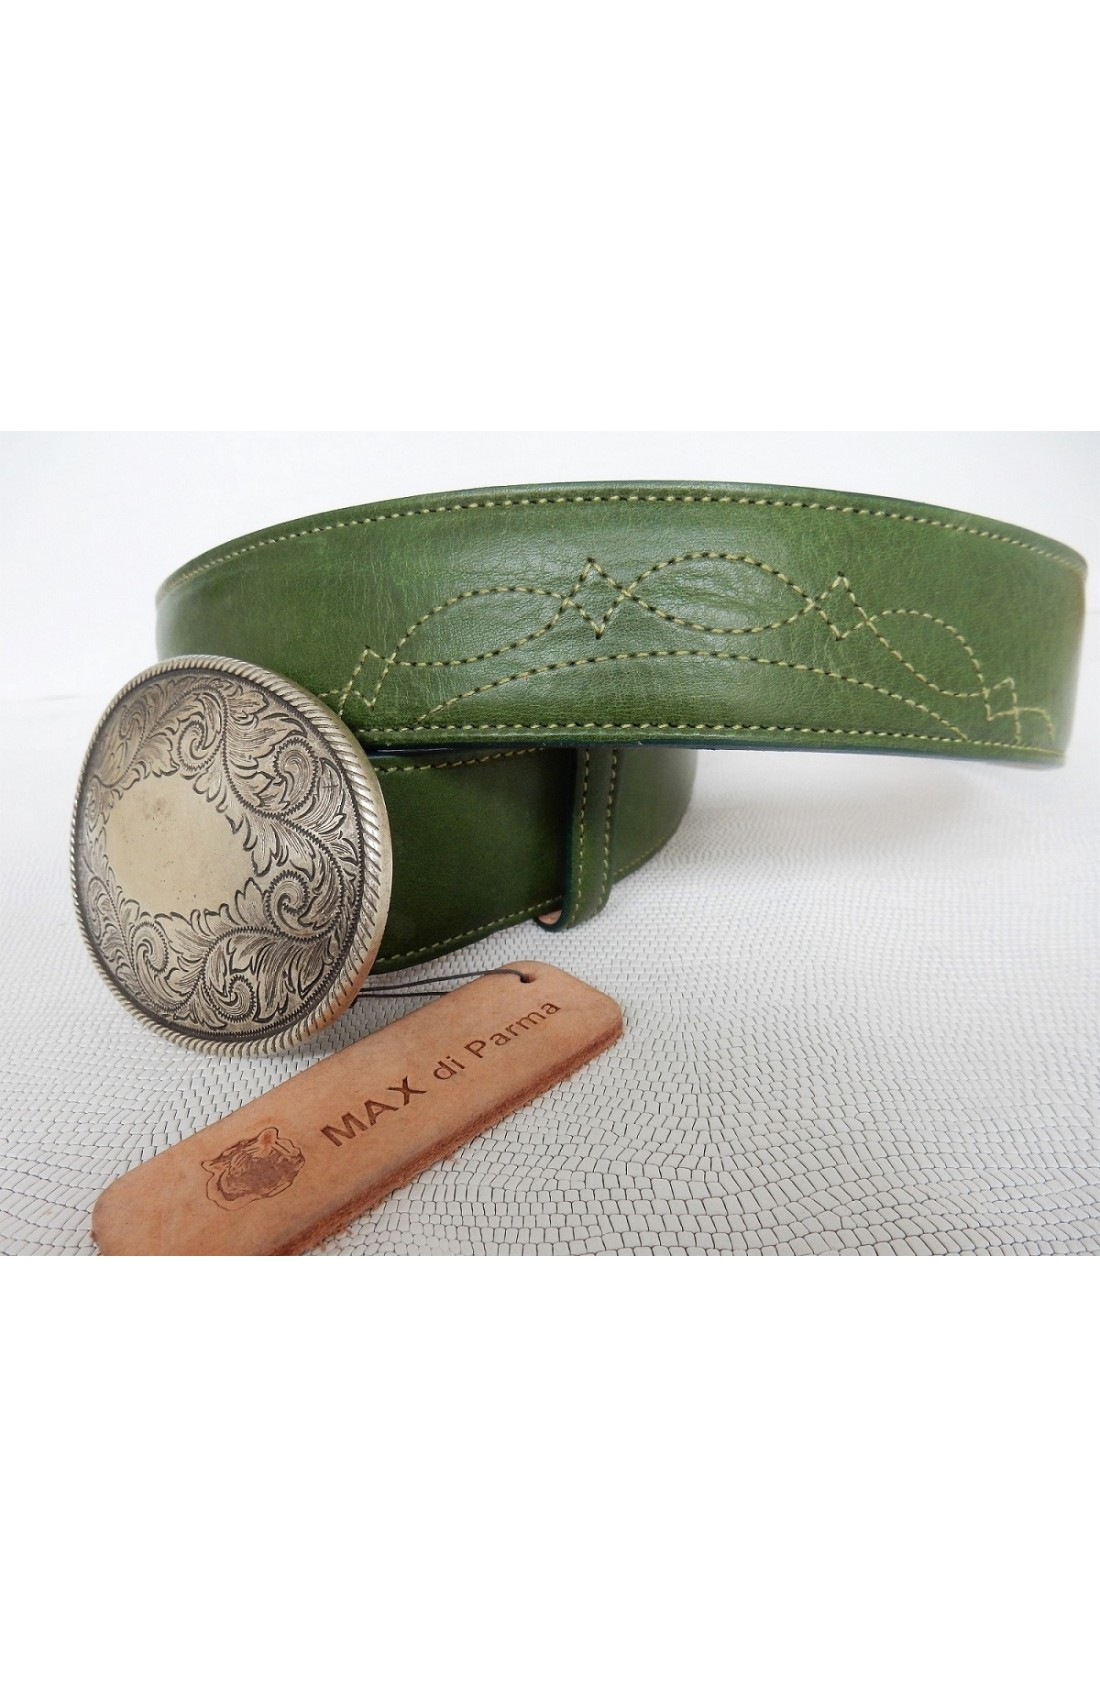 CINTURA SPECIALE art.492 KANSAS su spalle toro mm.40 var.62 verde avocado +cuciture verde in tinta ricamo (3)